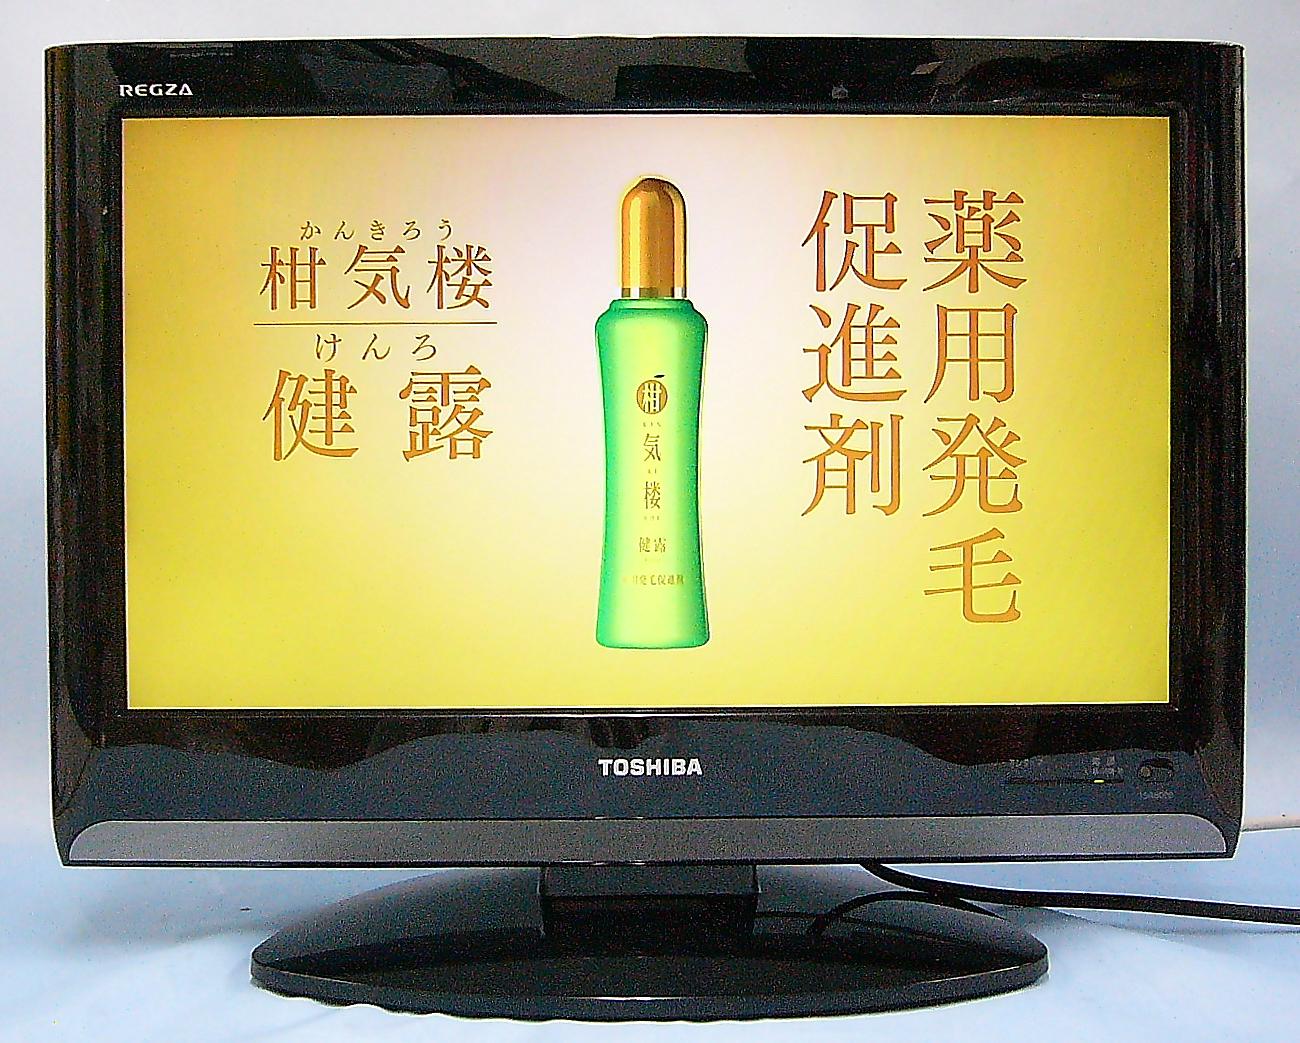 TOSHIBA 液晶テレビ 19A8000